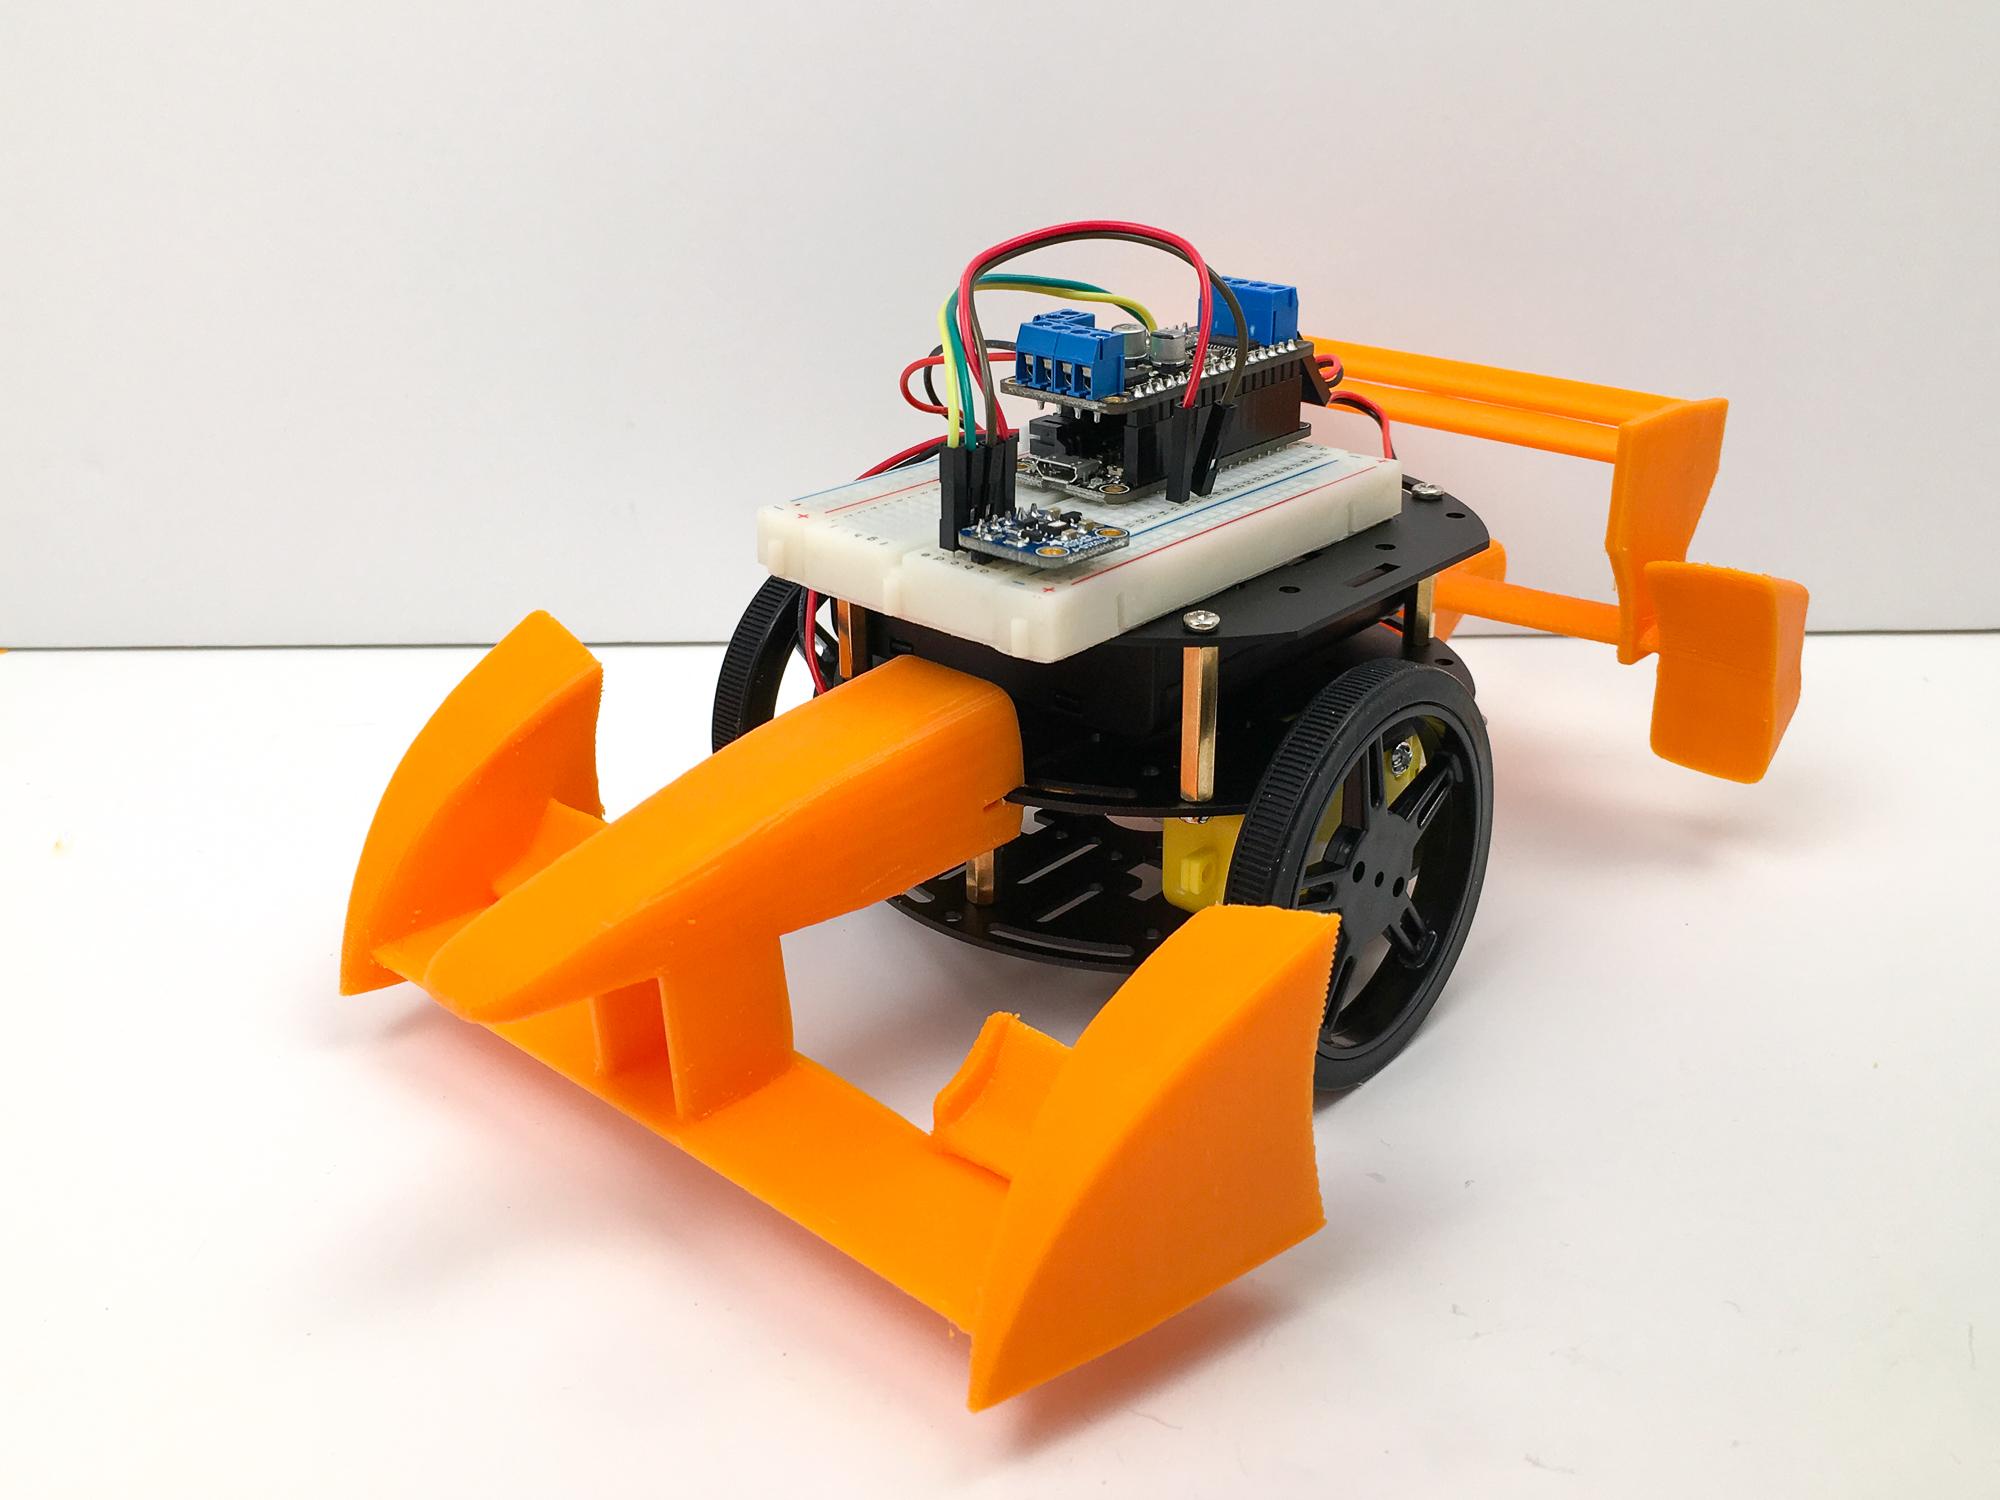 robotics_IMG_0070_2k.jpg